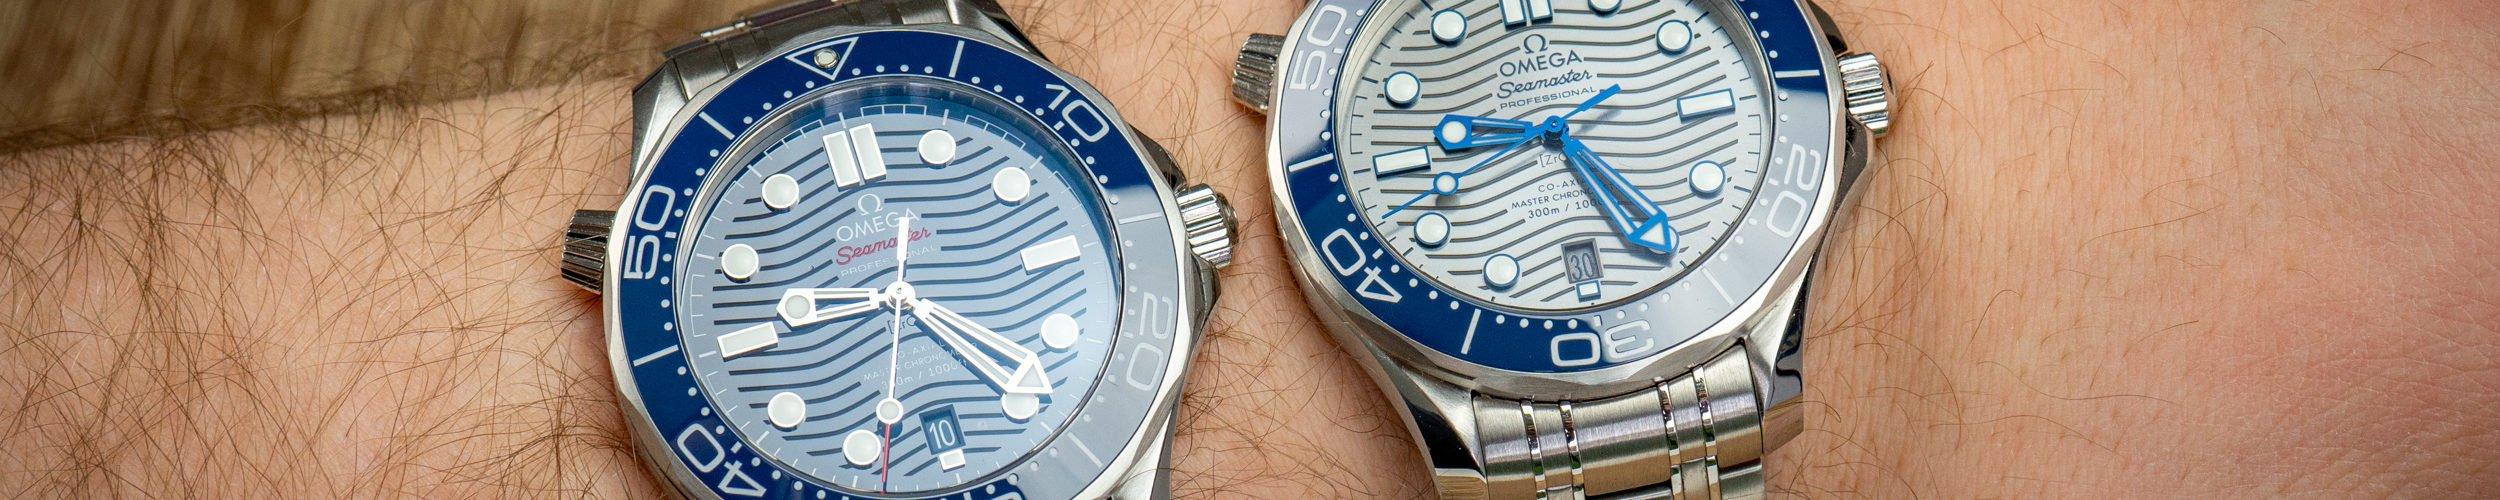 Omega-Seamaster-300m-graues-vs.-blaues-Zifferblatt-Keramik